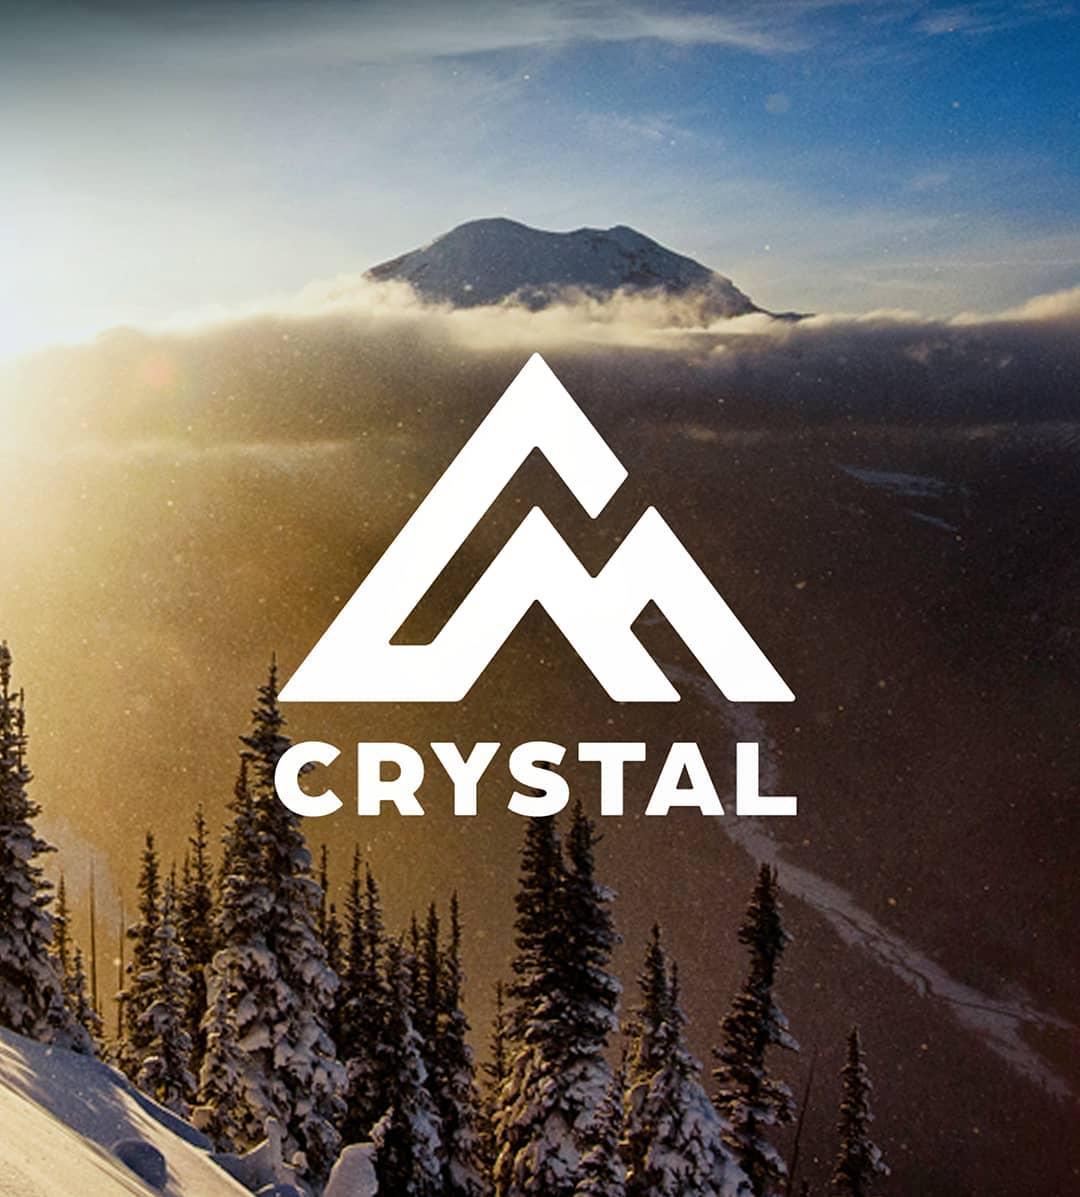 crystal mountain, washington, new logo